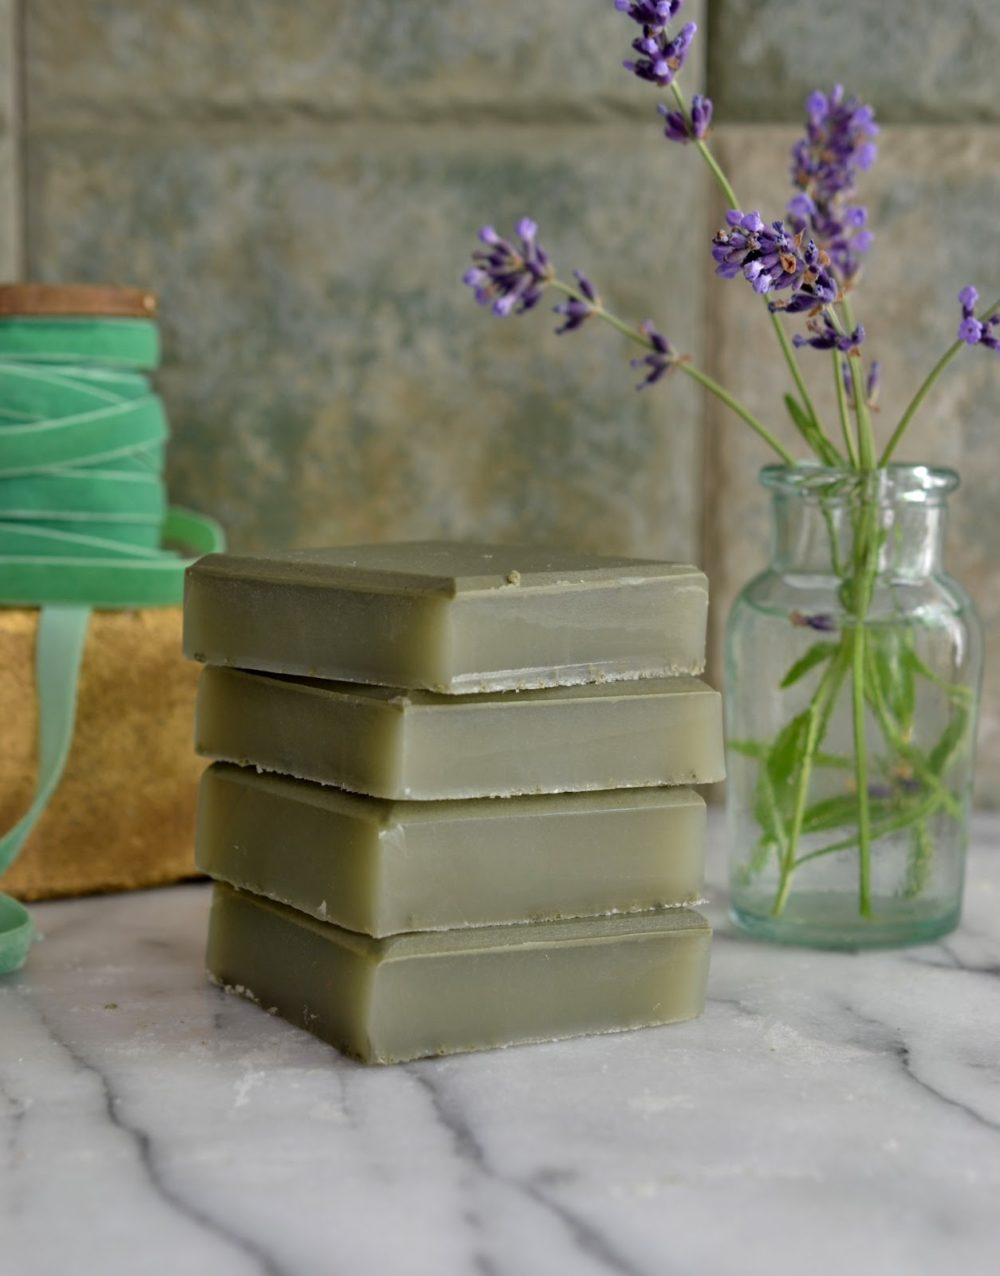 3 bienfaits du savon de marseille - Composition savon de marseille ...